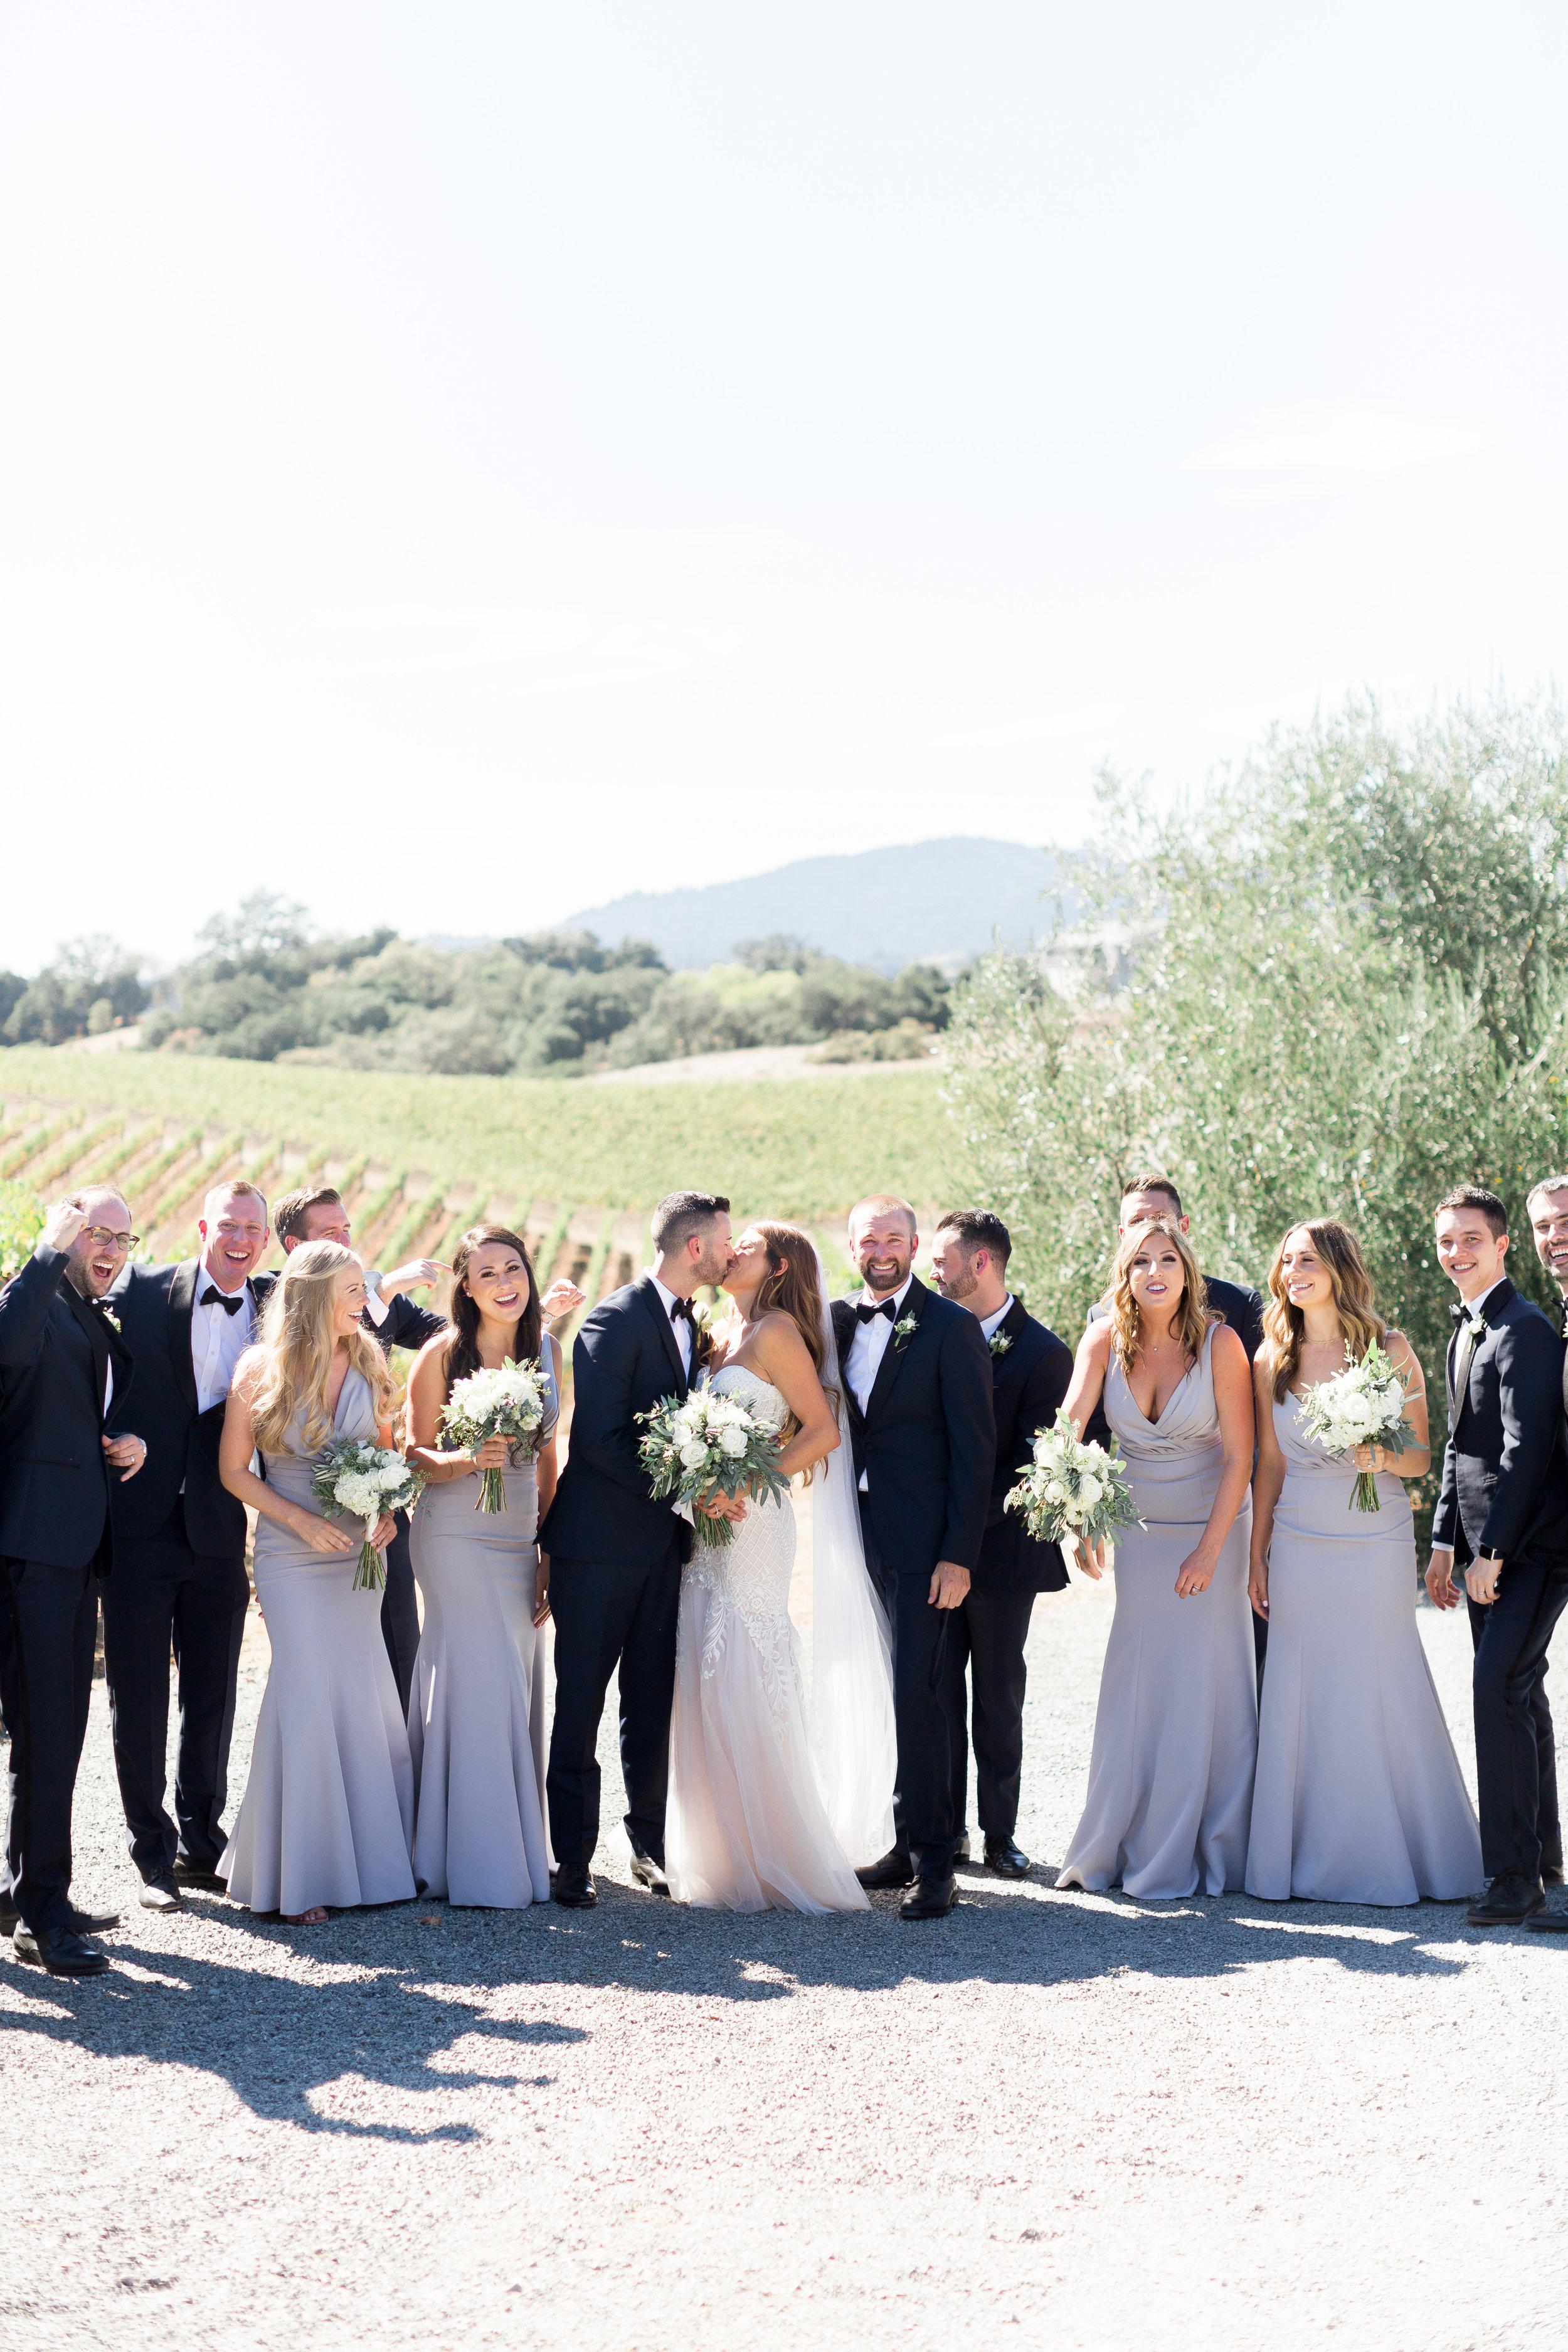 Calegari-Vineyards-Healdsburg-Wedding-Photographer (94 of 262).jpg